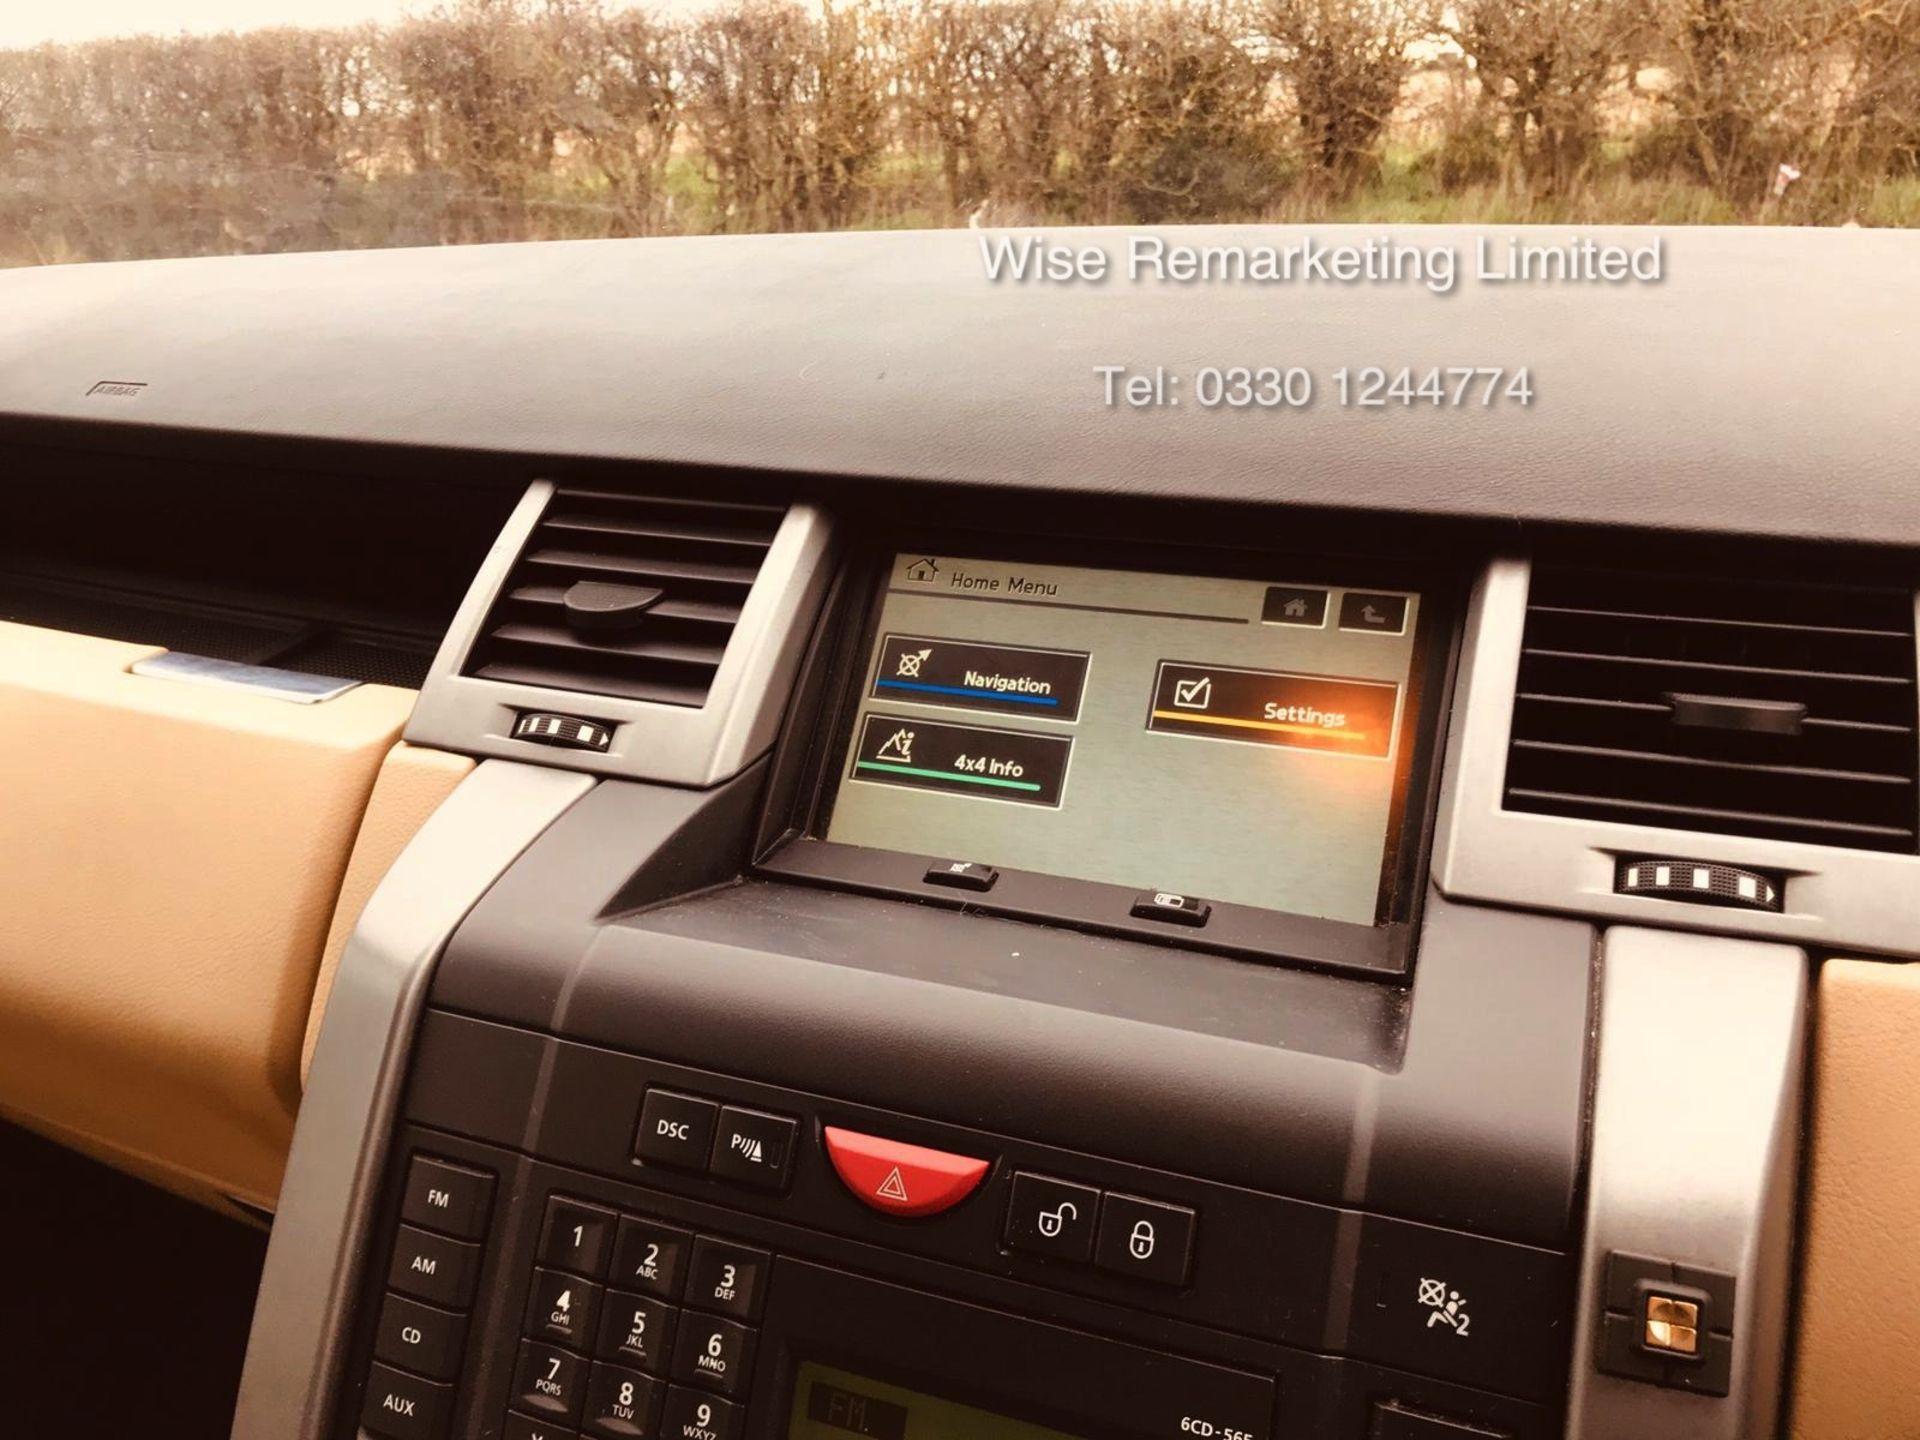 Range Rover Sport 2.7 TDV6 HSE Auto - 2008 Model - Cream Leather - Sat Nav - Heated Seats - Image 17 of 19